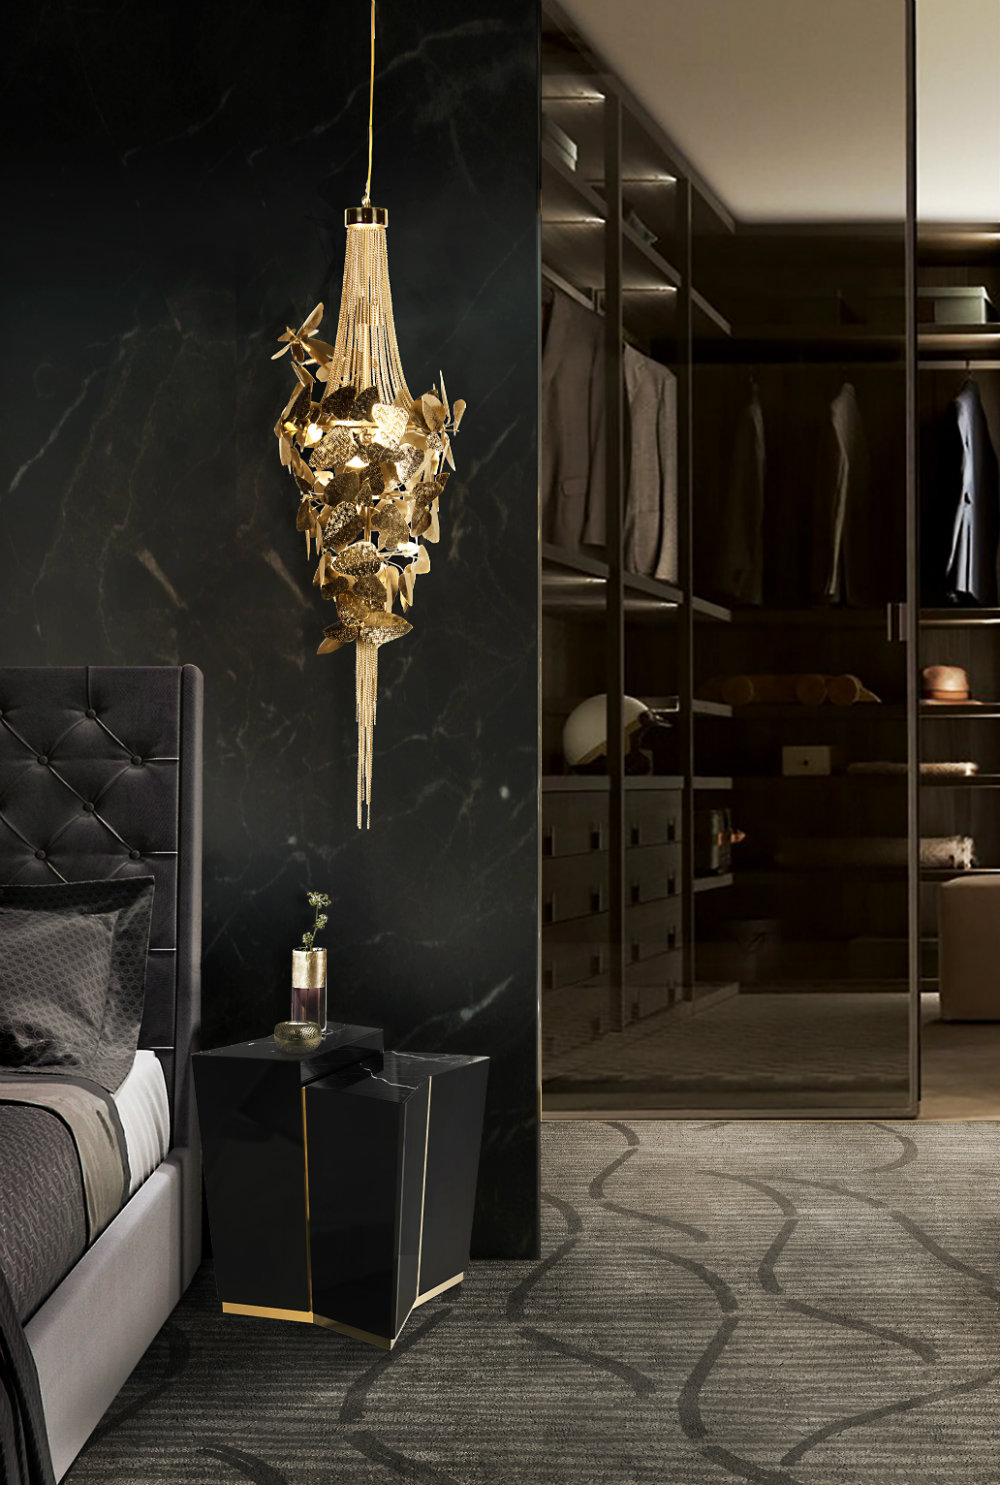 Bedroom Design Ideas From Top Interior Designers